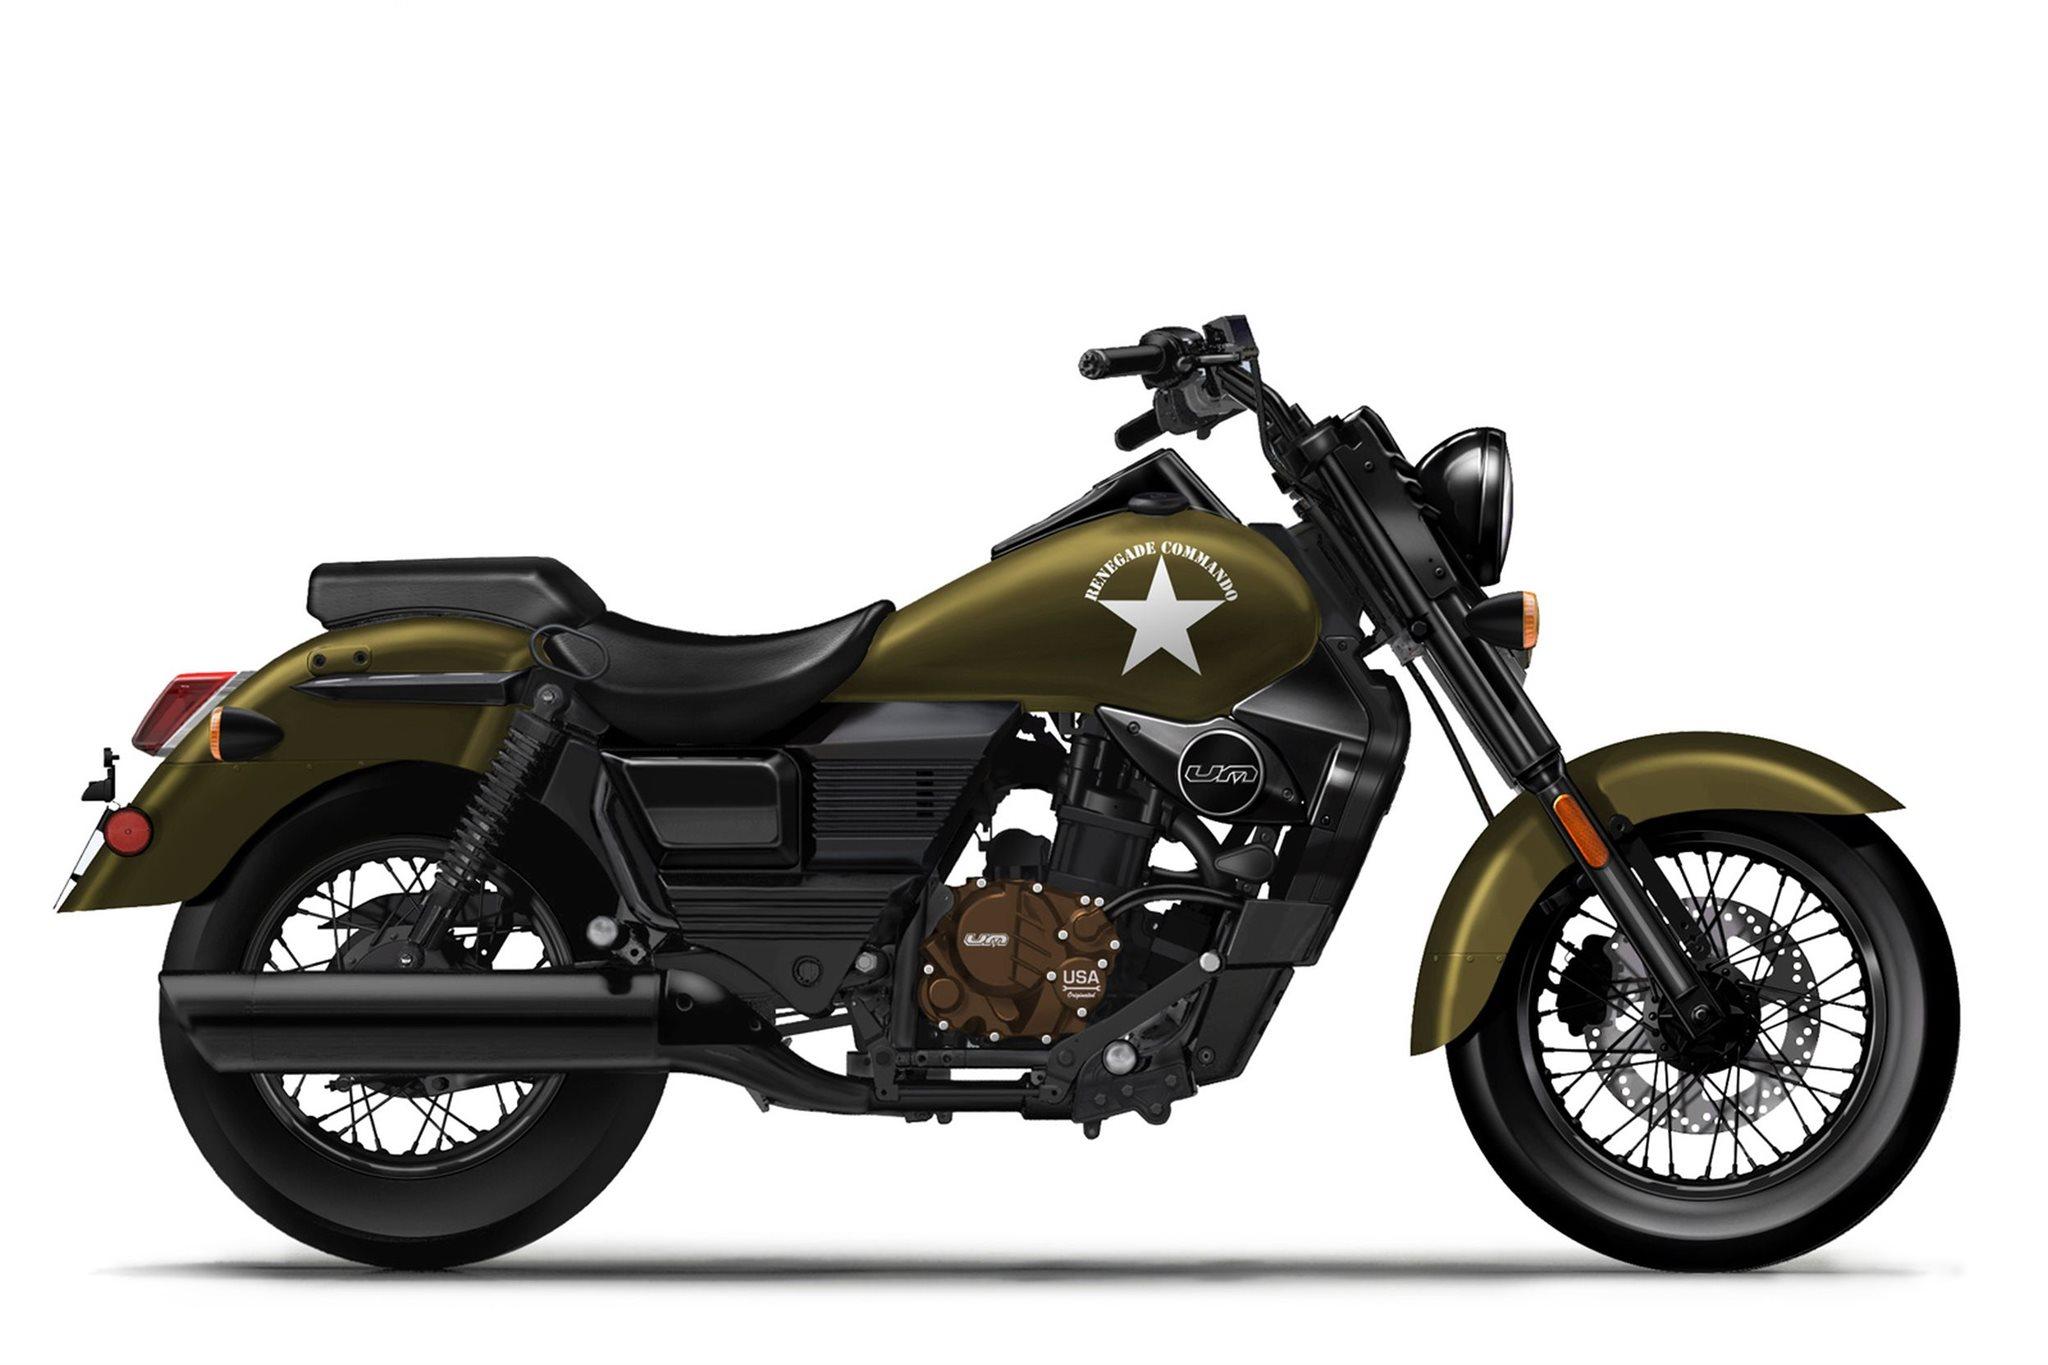 United Motors UM Renegade Commando 125 Motorrad, neu